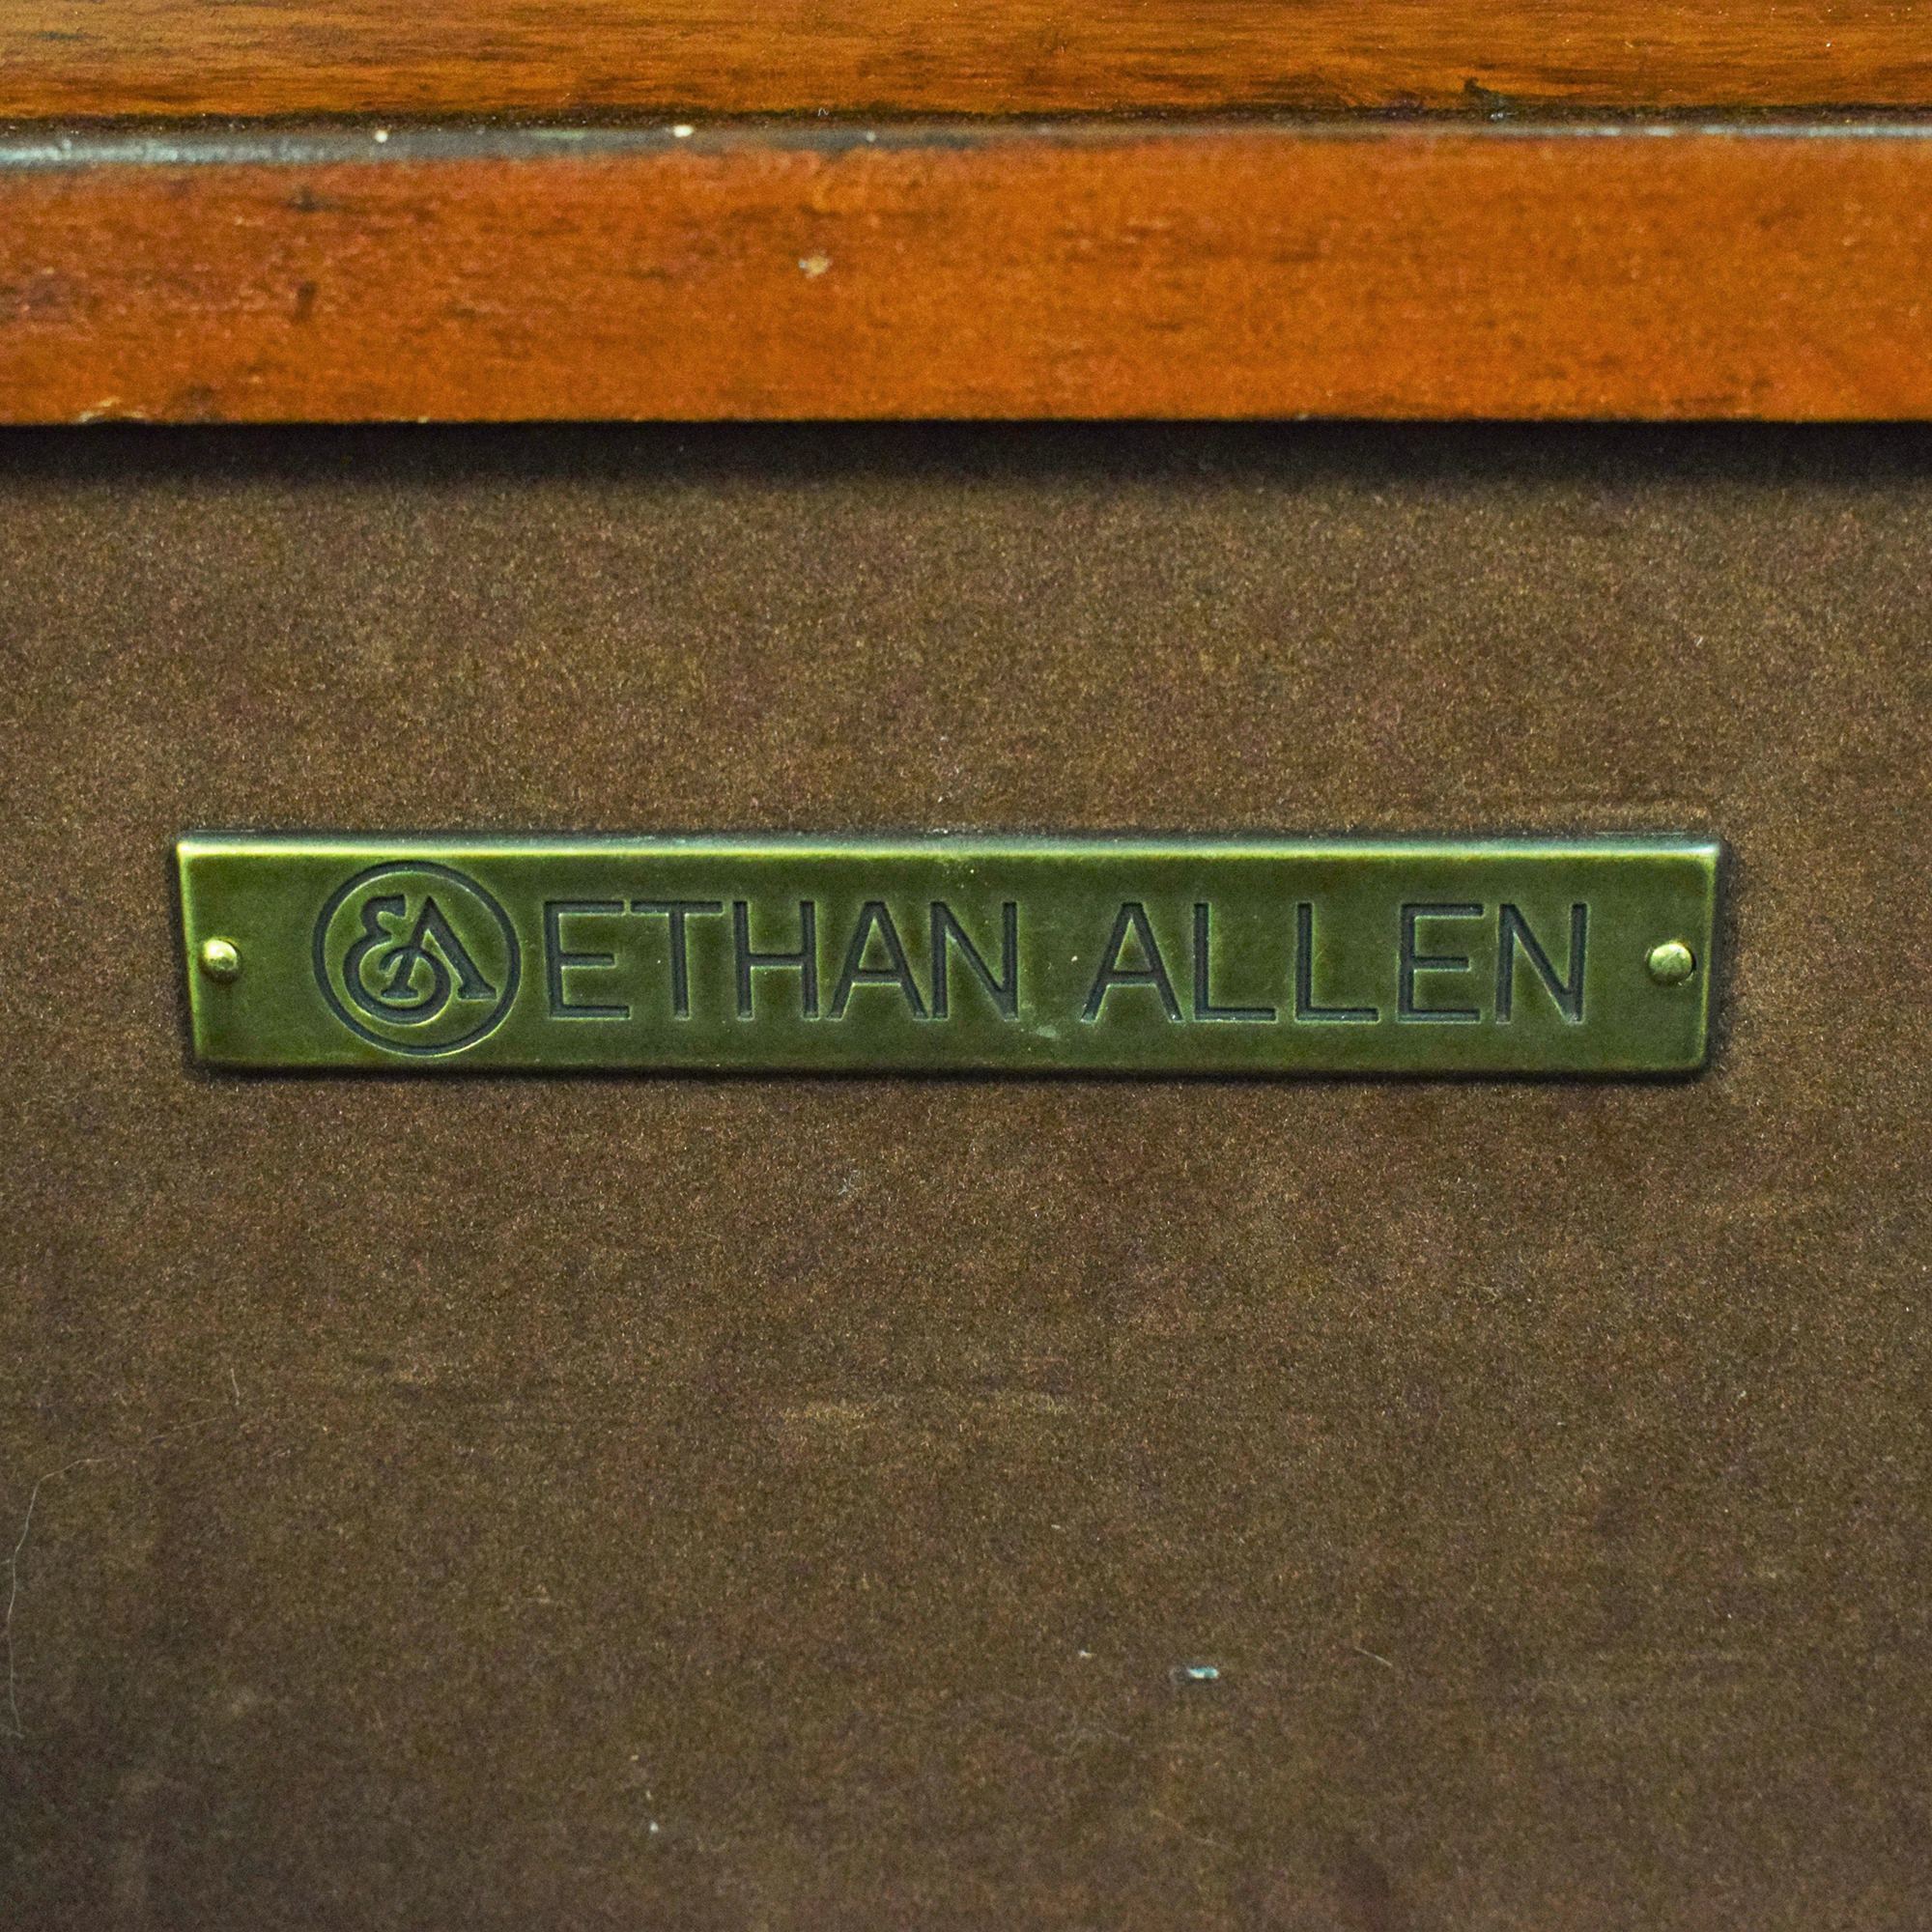 Ethan Allen Dome Top Jewelry Box / Decor